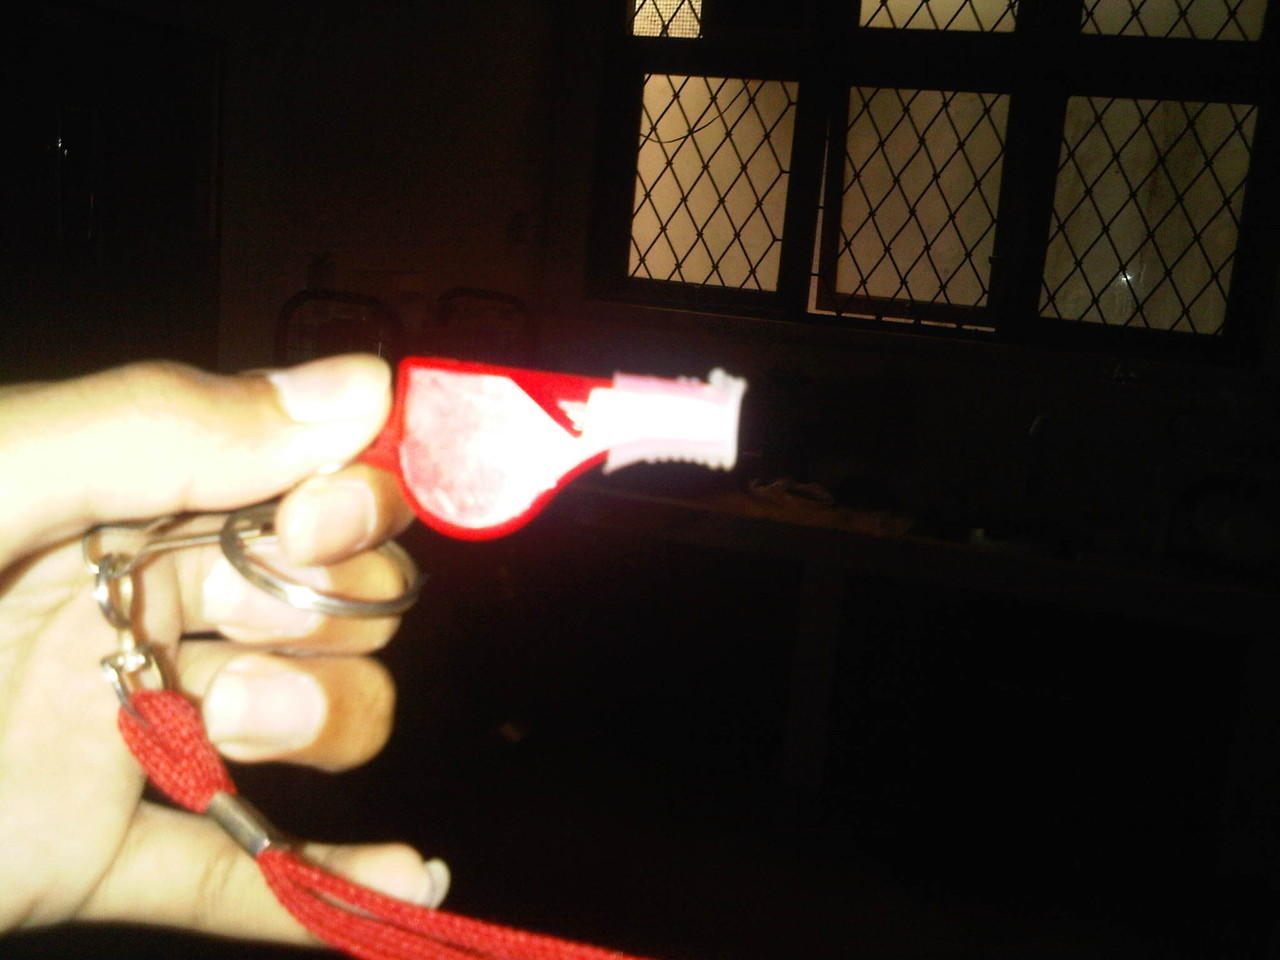 2nd falconry glove, perch, whistle(peluit) and equipment murah namun bukan murahan!!!